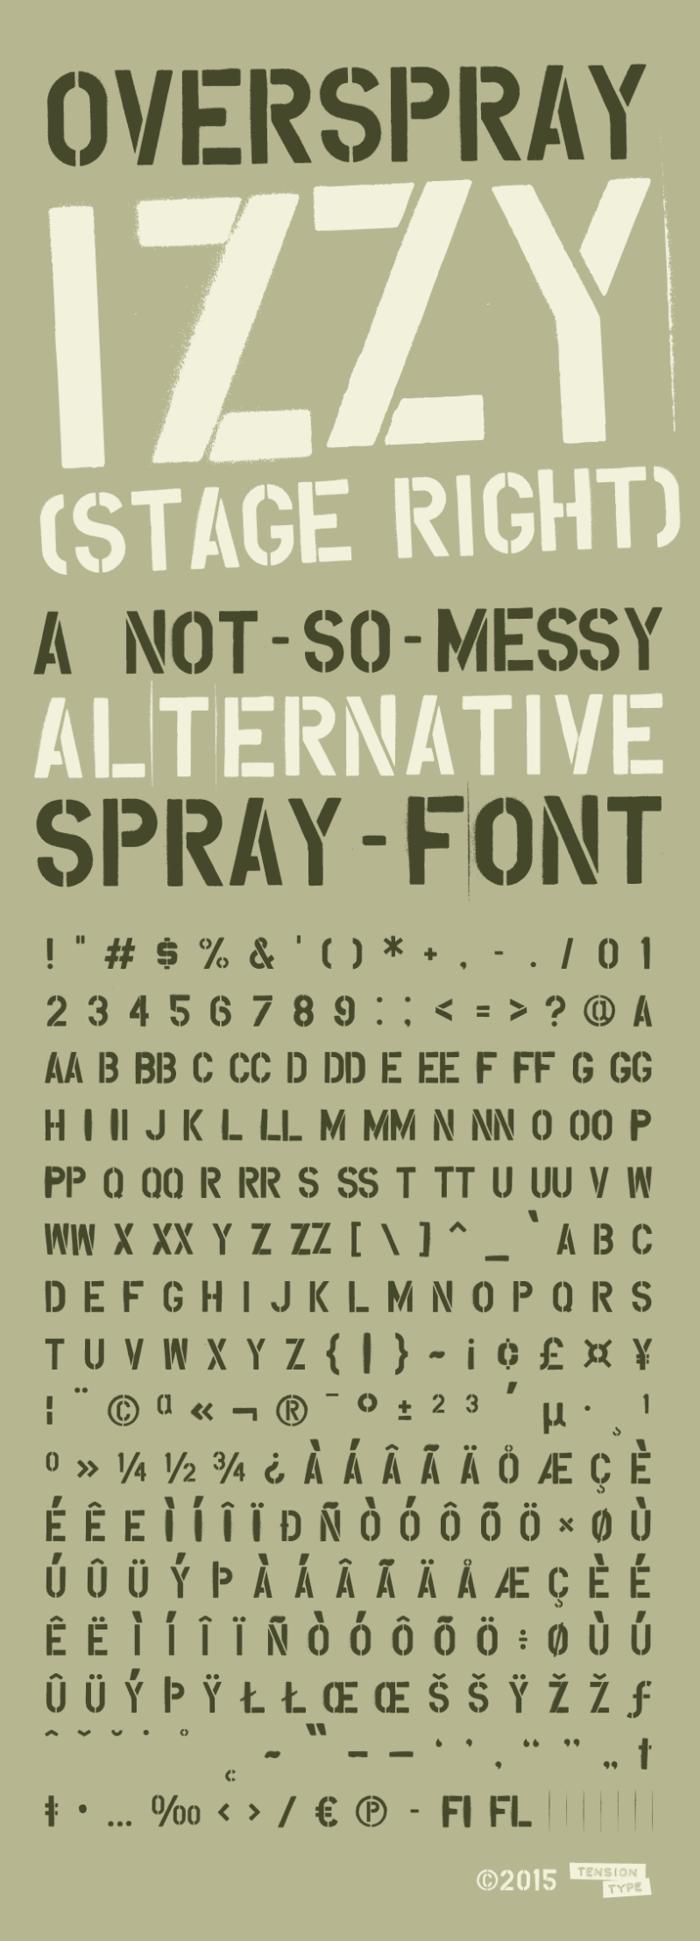 Overspray poster